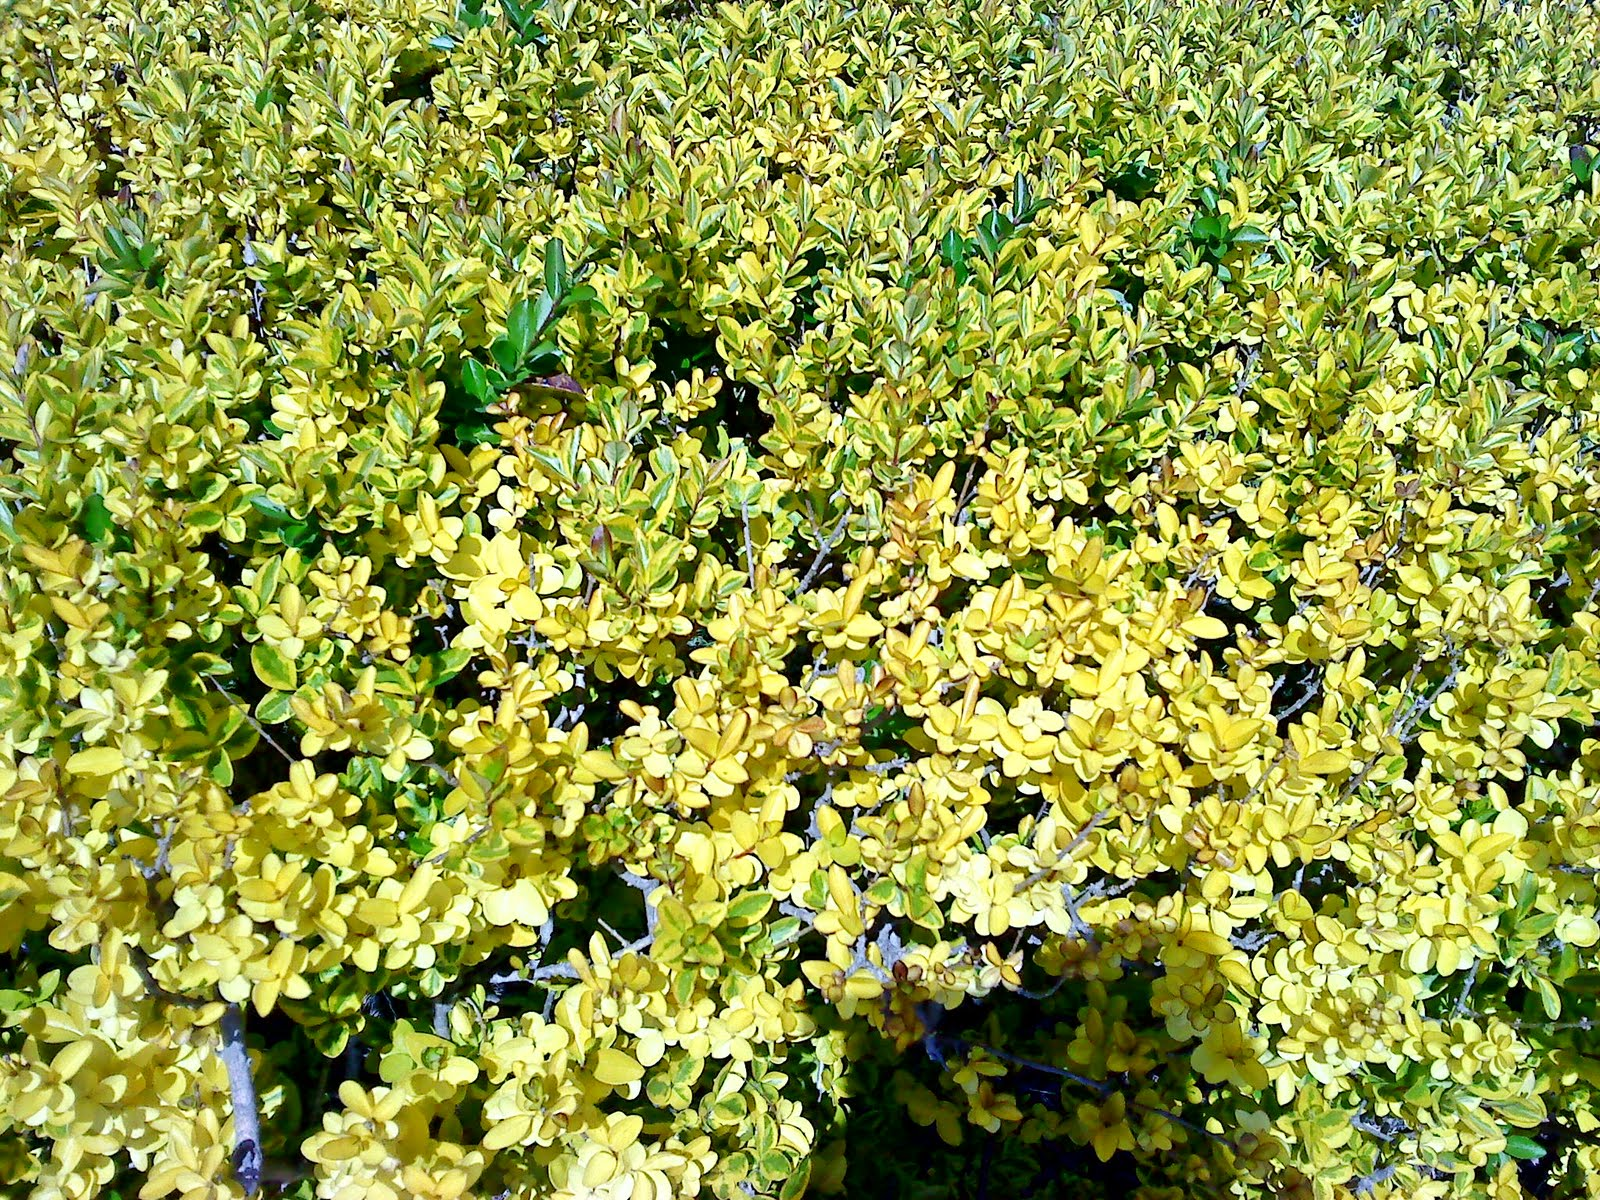 Egresados medicina tijuana - Clases de flores amarillas ...